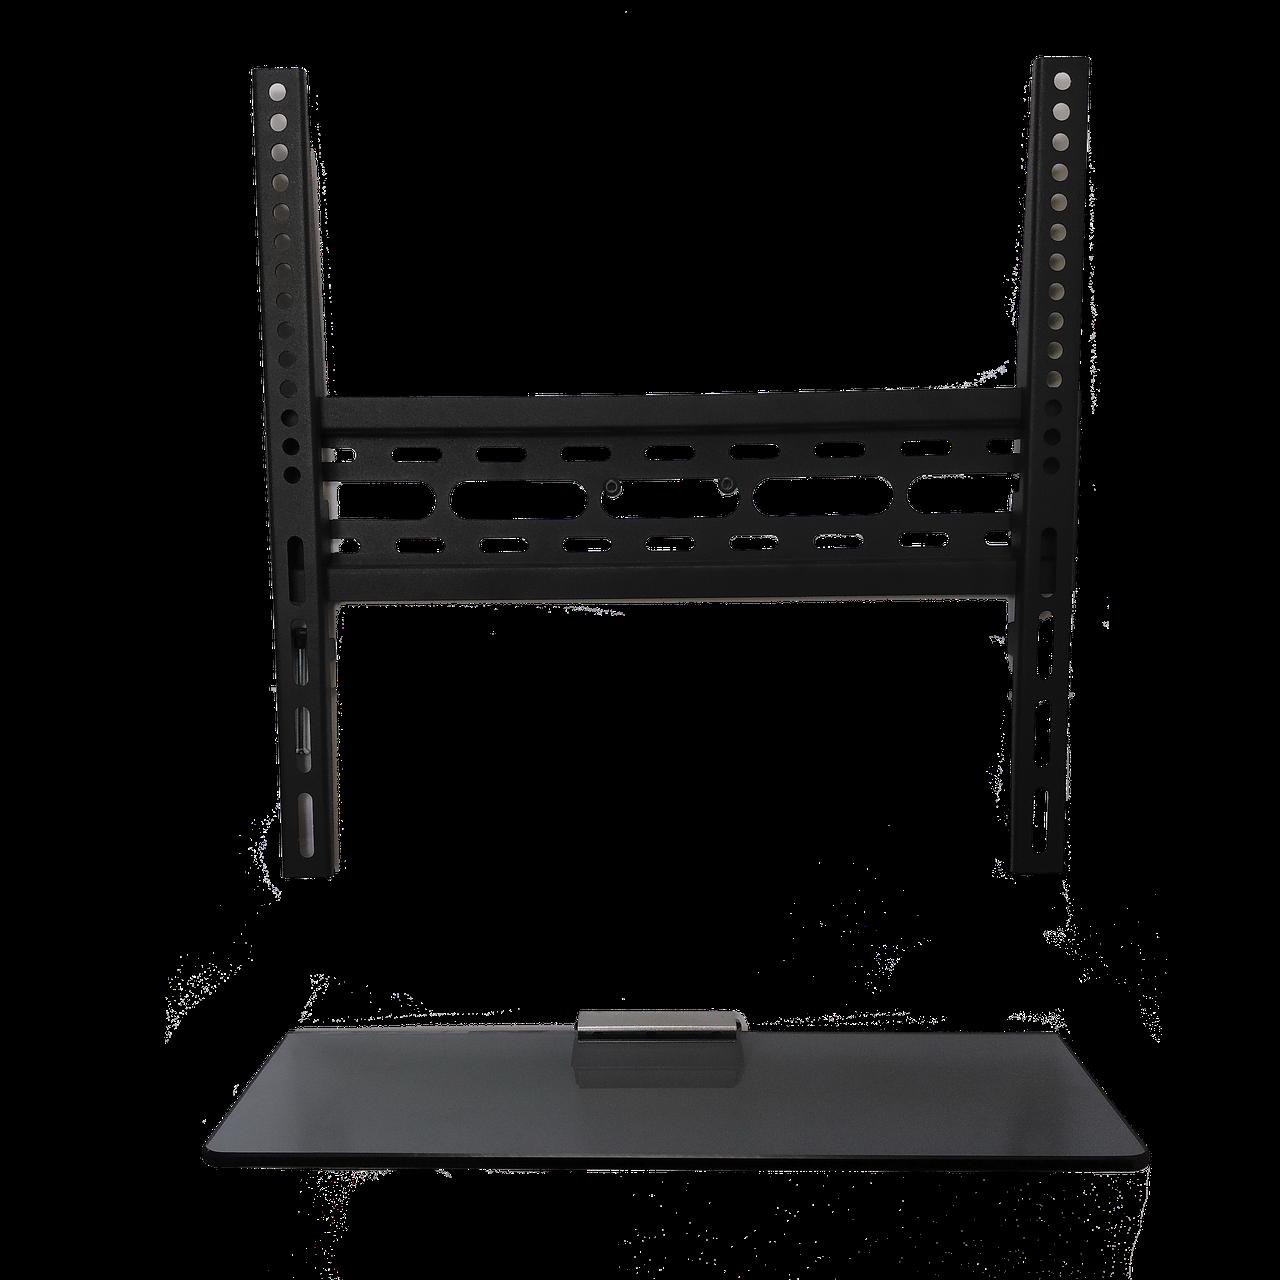 Кронштейн TV с полкой для тюнера Commus 907SF-PL10PG6